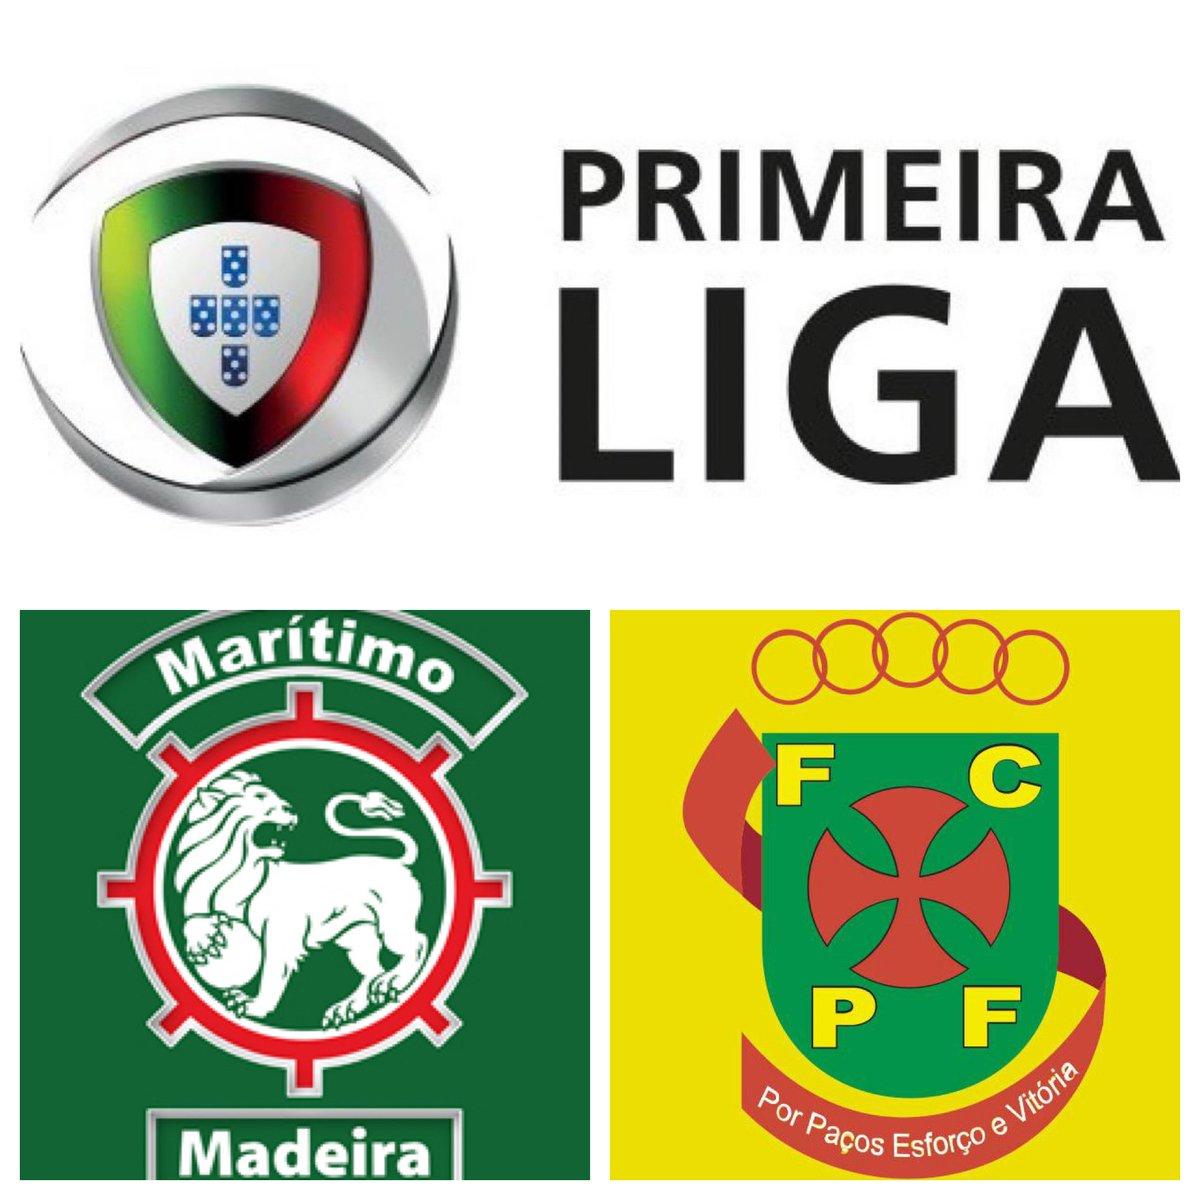 #IESRSN #Maritimo @ #Ferreira is underway! #PortugueseLiga